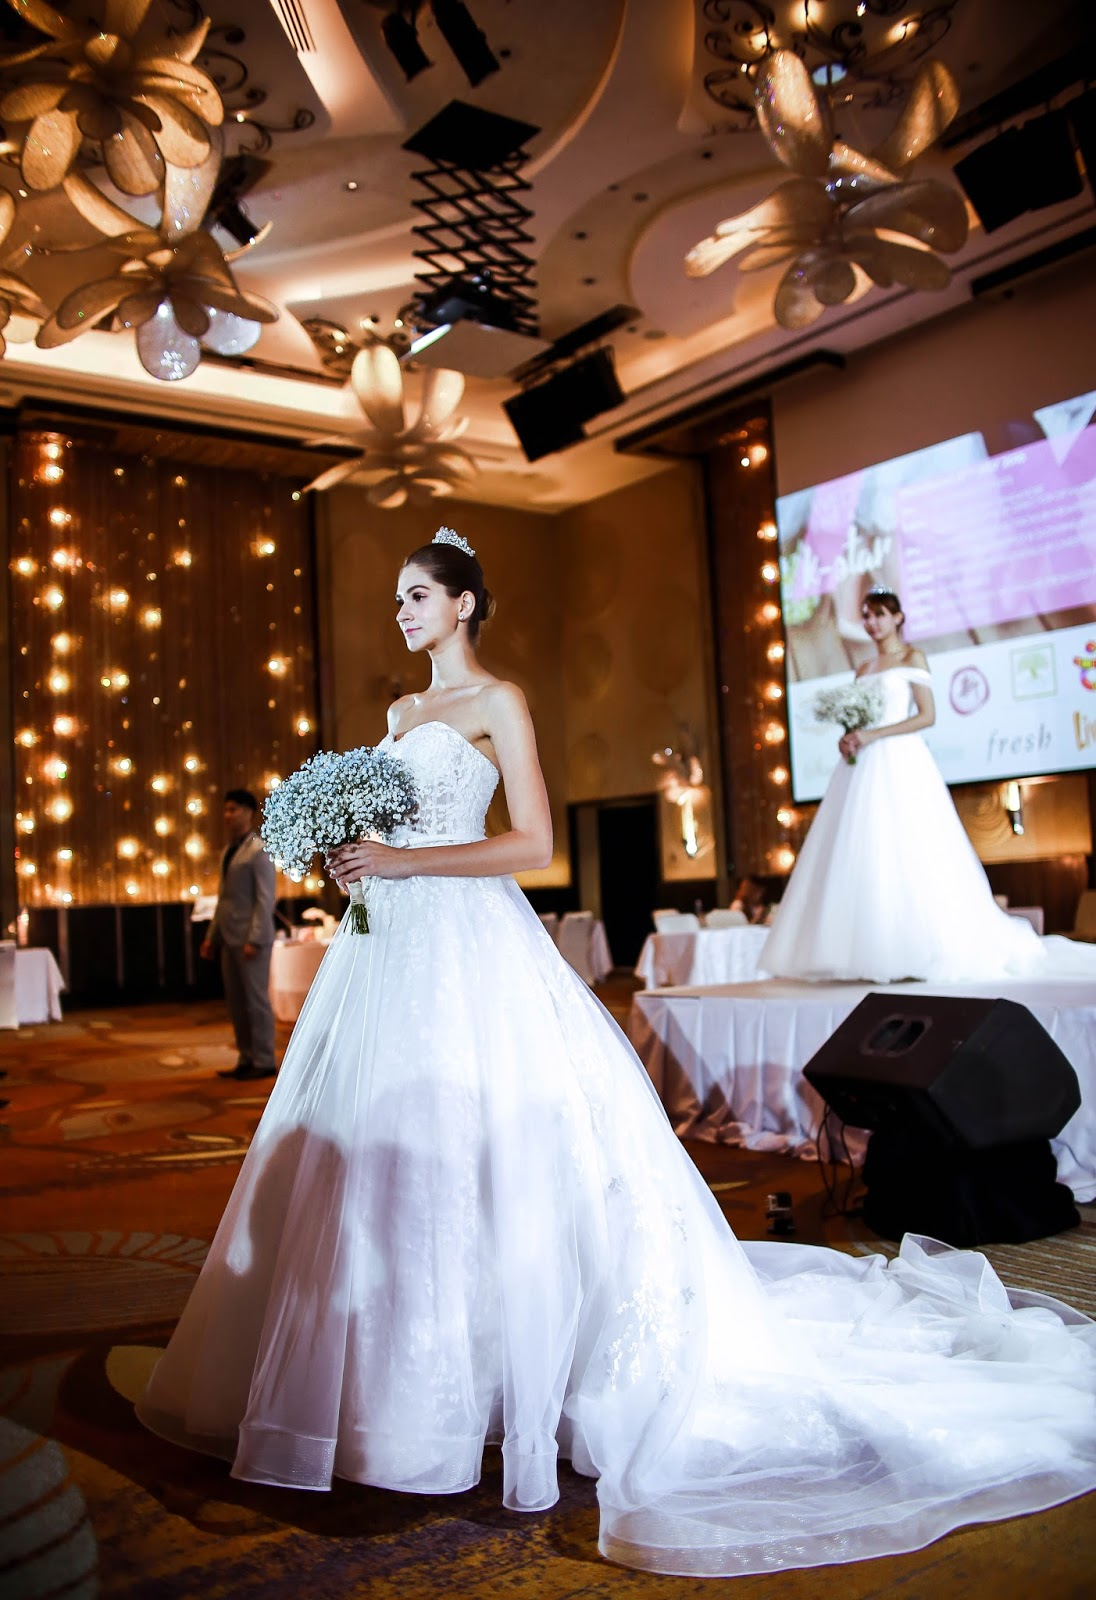 Korean Style Wedding Dress 26 Unique What is a Korean